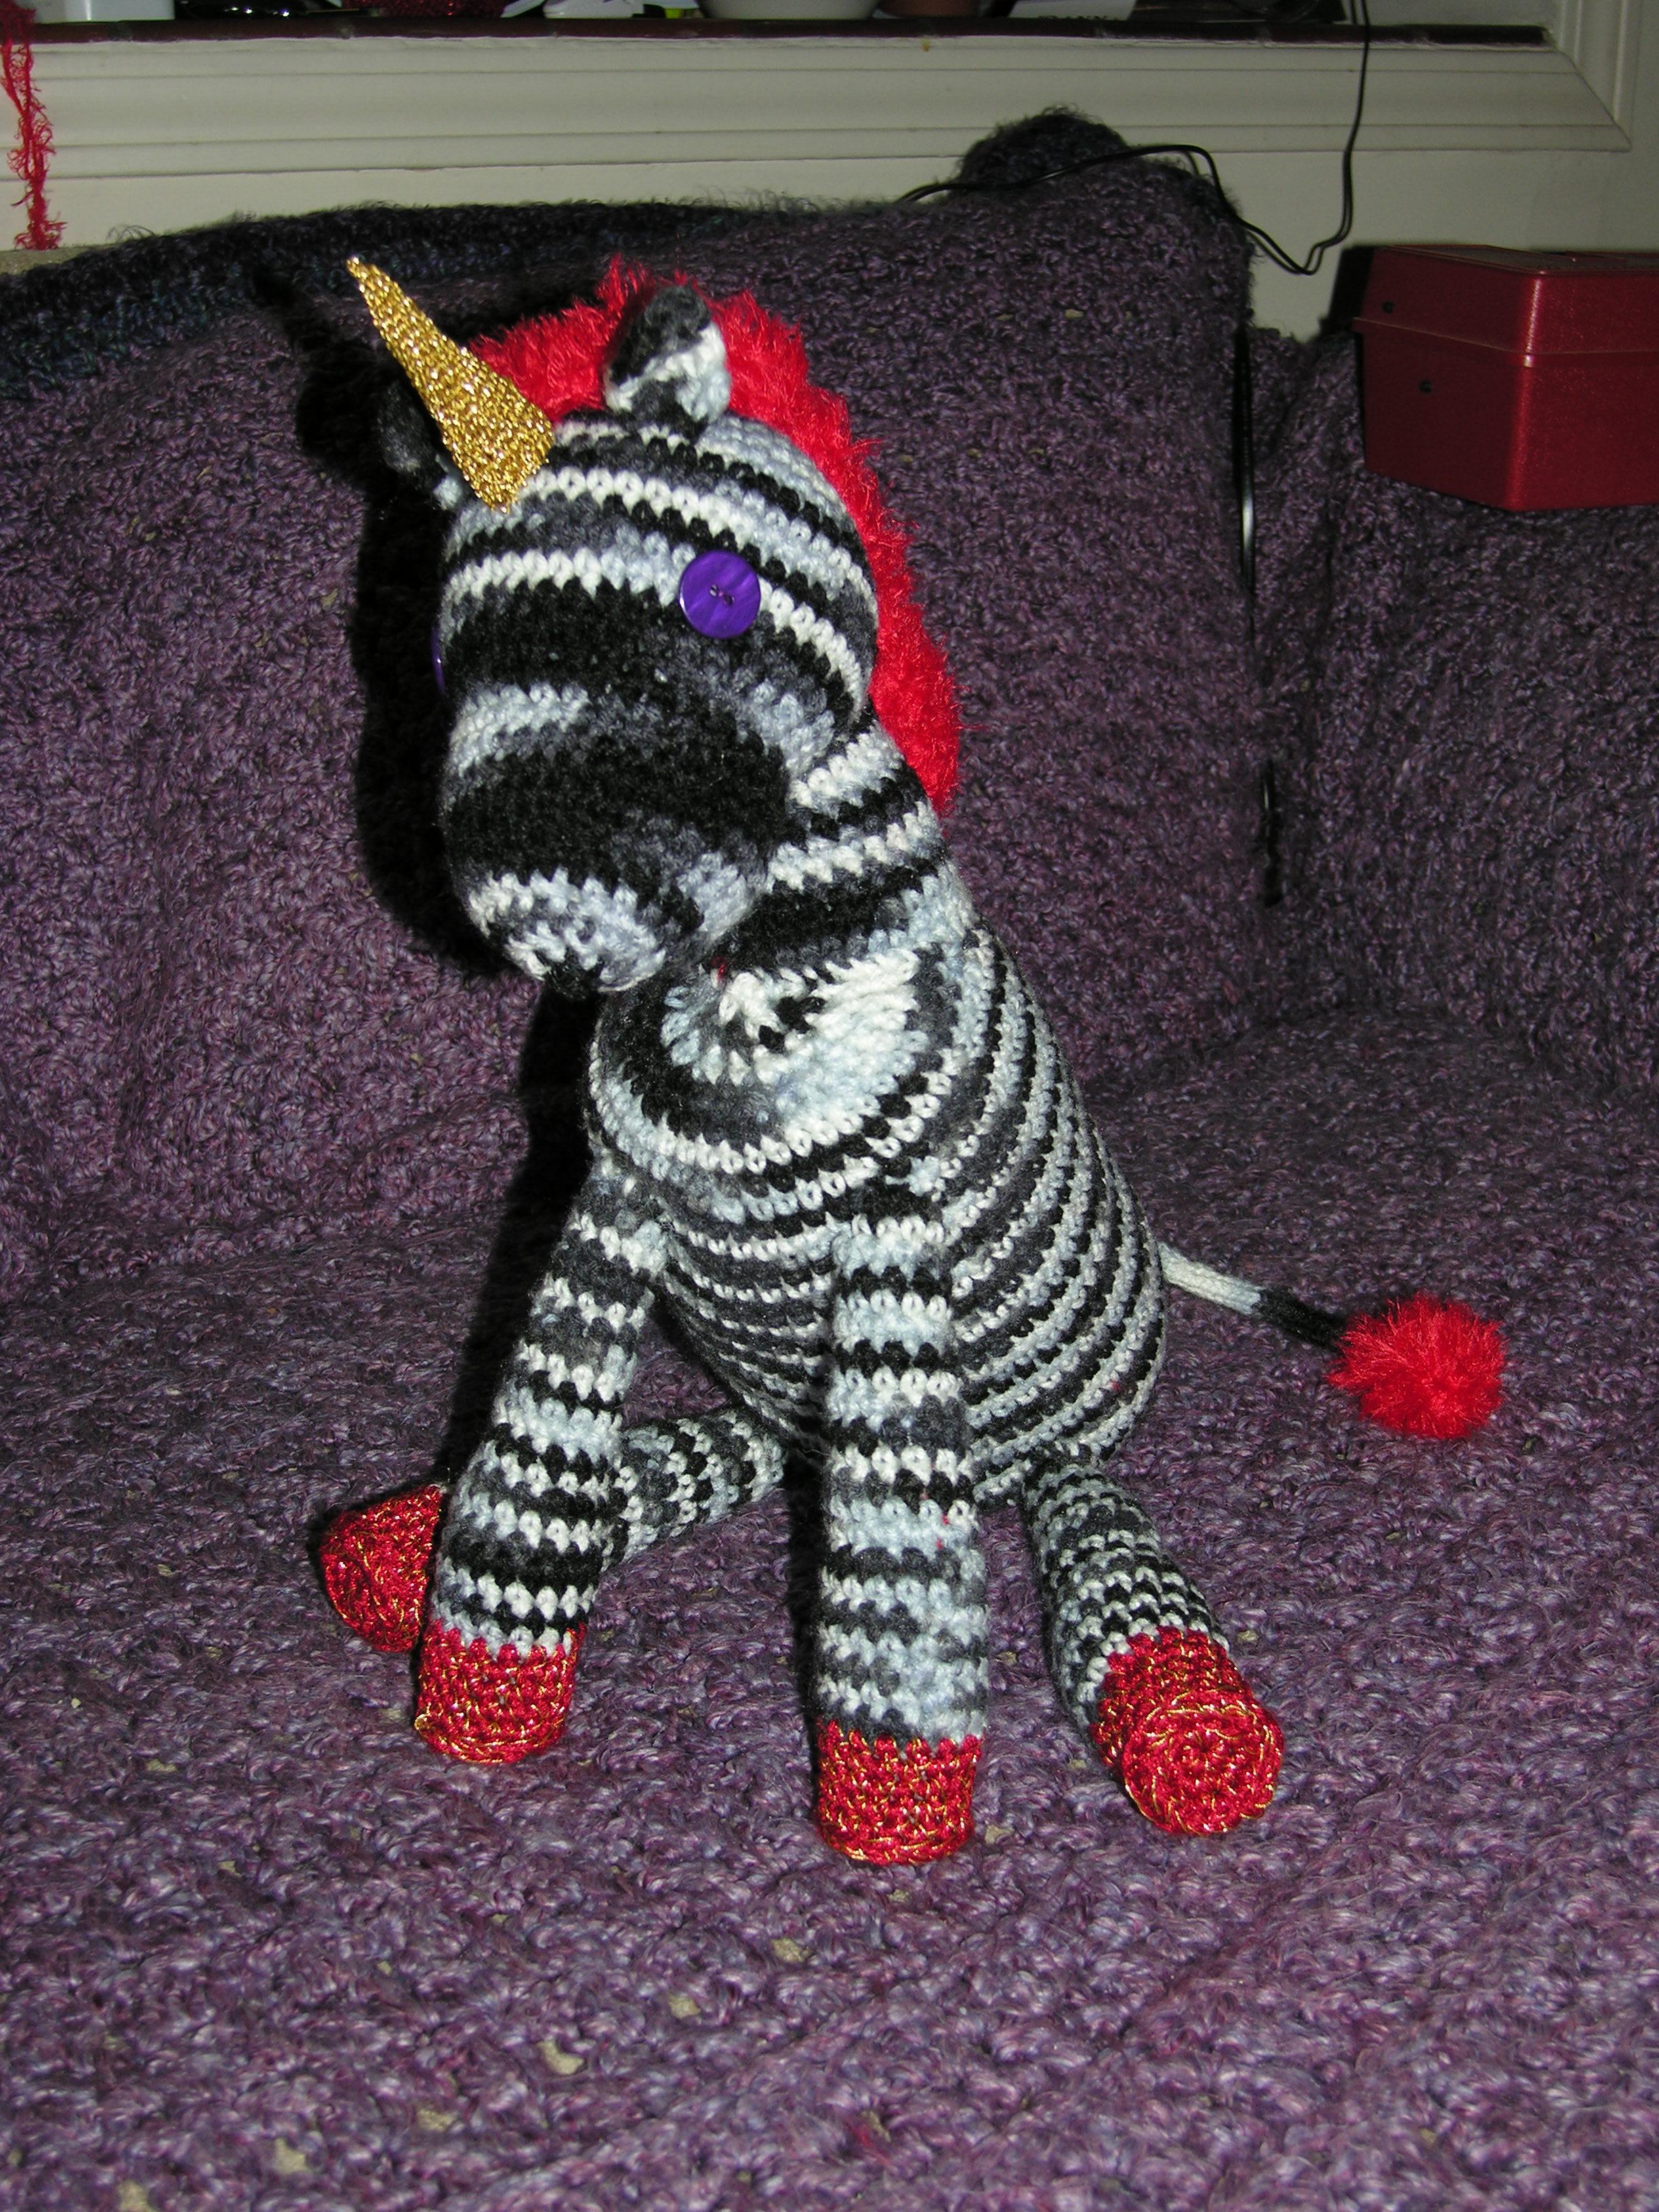 Crocheted Punk Unicorn Toy